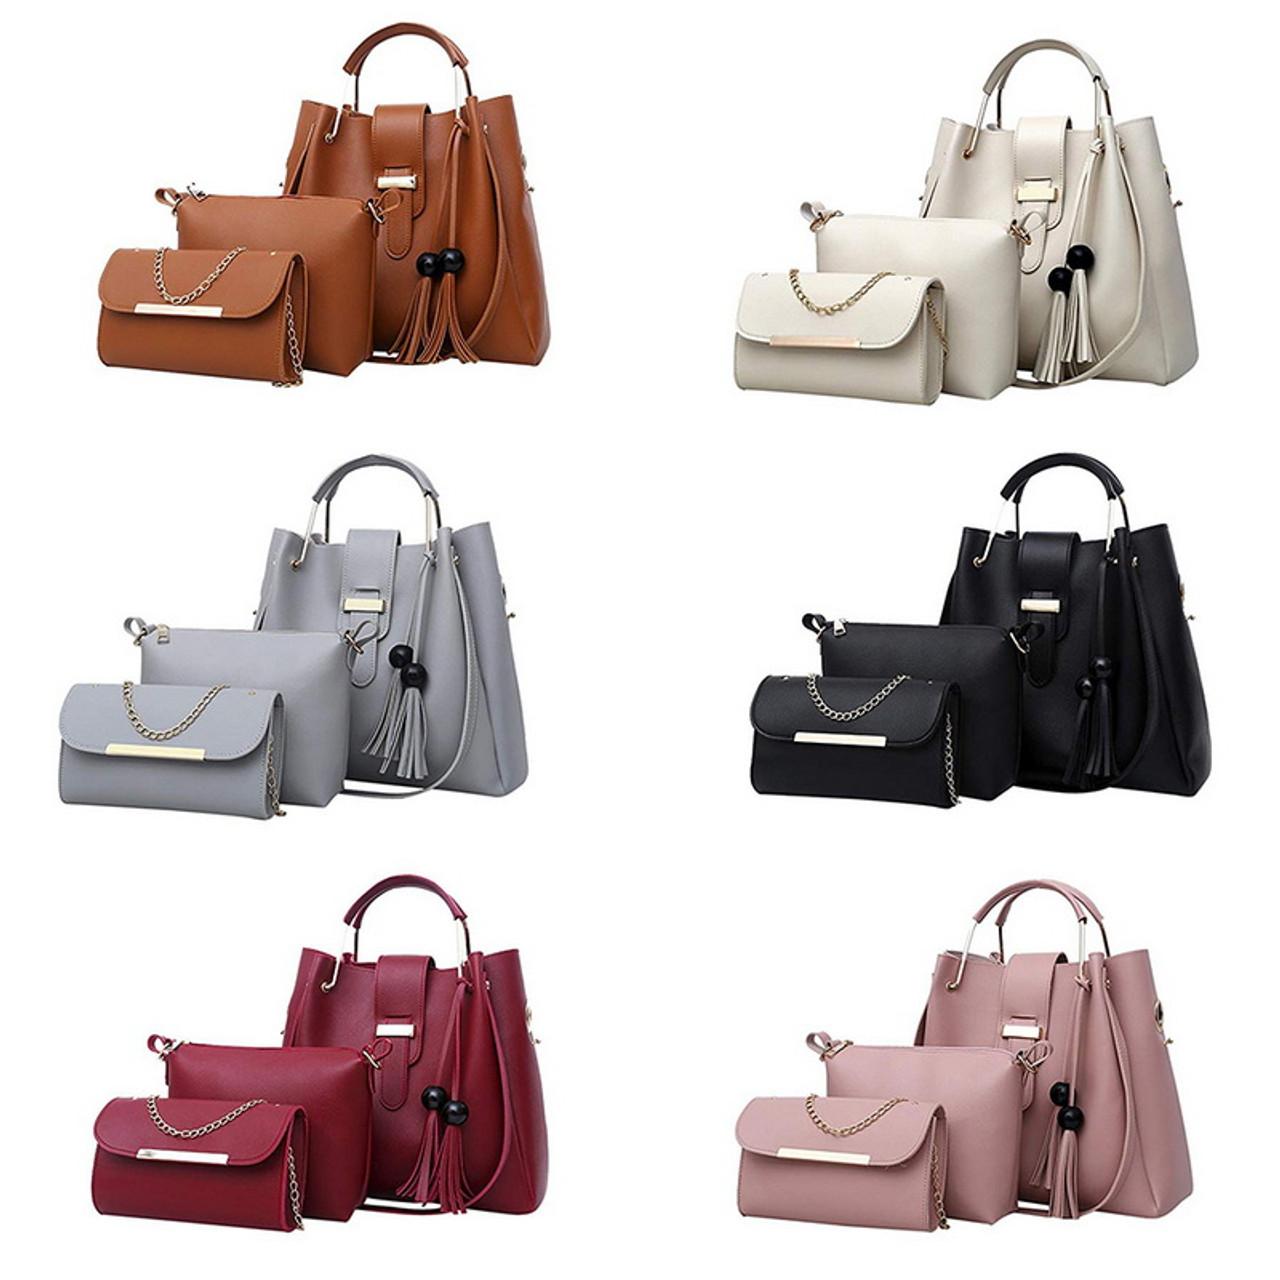 0d5fb36bd318 Women Handbags Leather Shoulder Bags Large Capacity Casual Tote Bag Female  Tassel Bucket Purses And Handbags ...